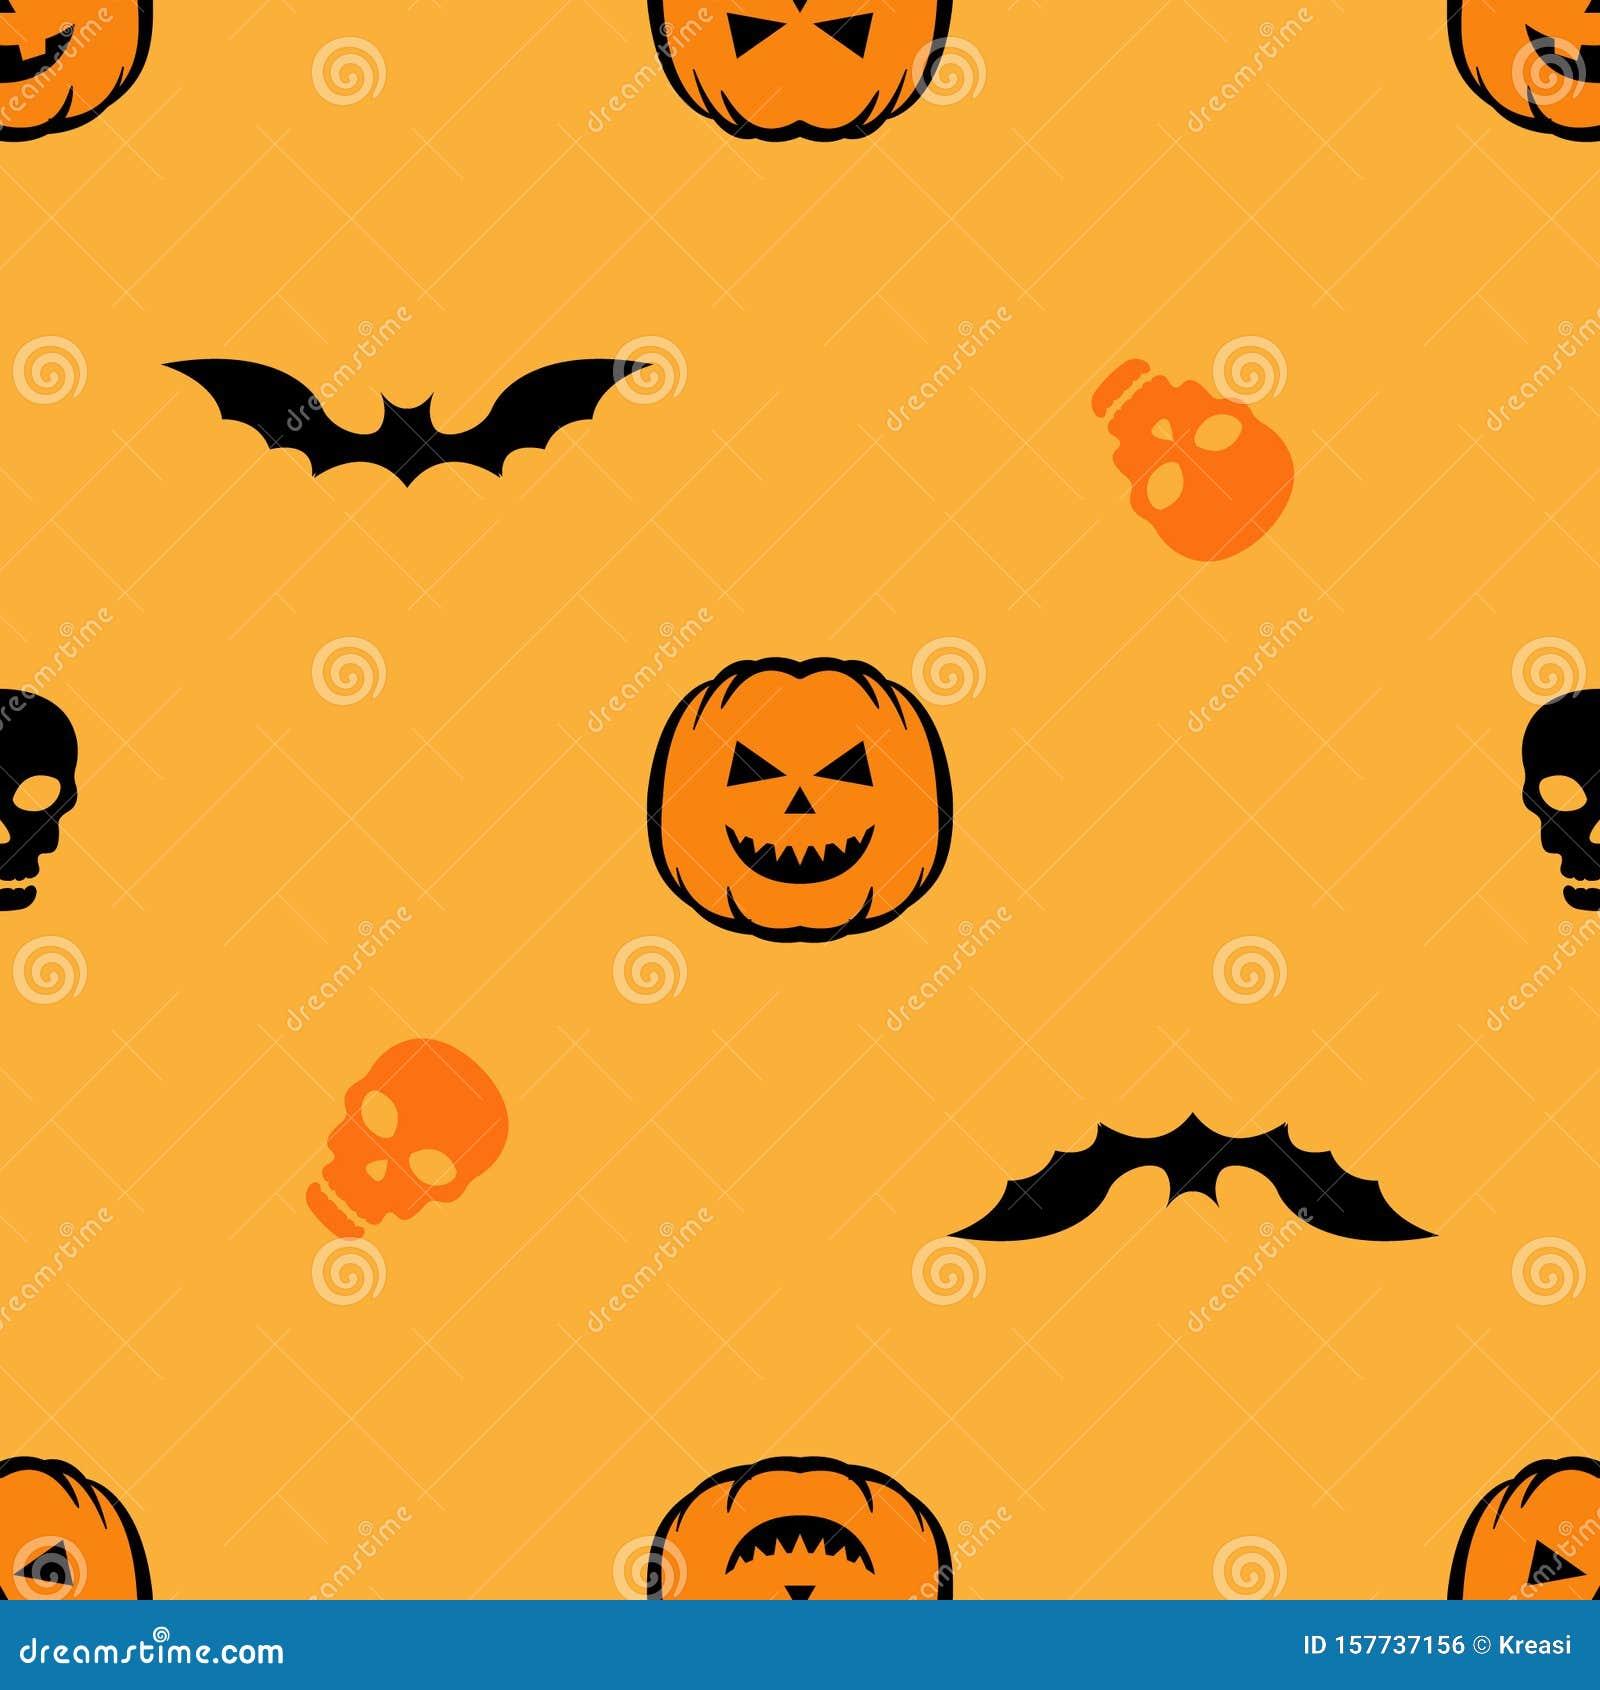 Seamless Pattern With Skull Bat And Pumpkin Halloween